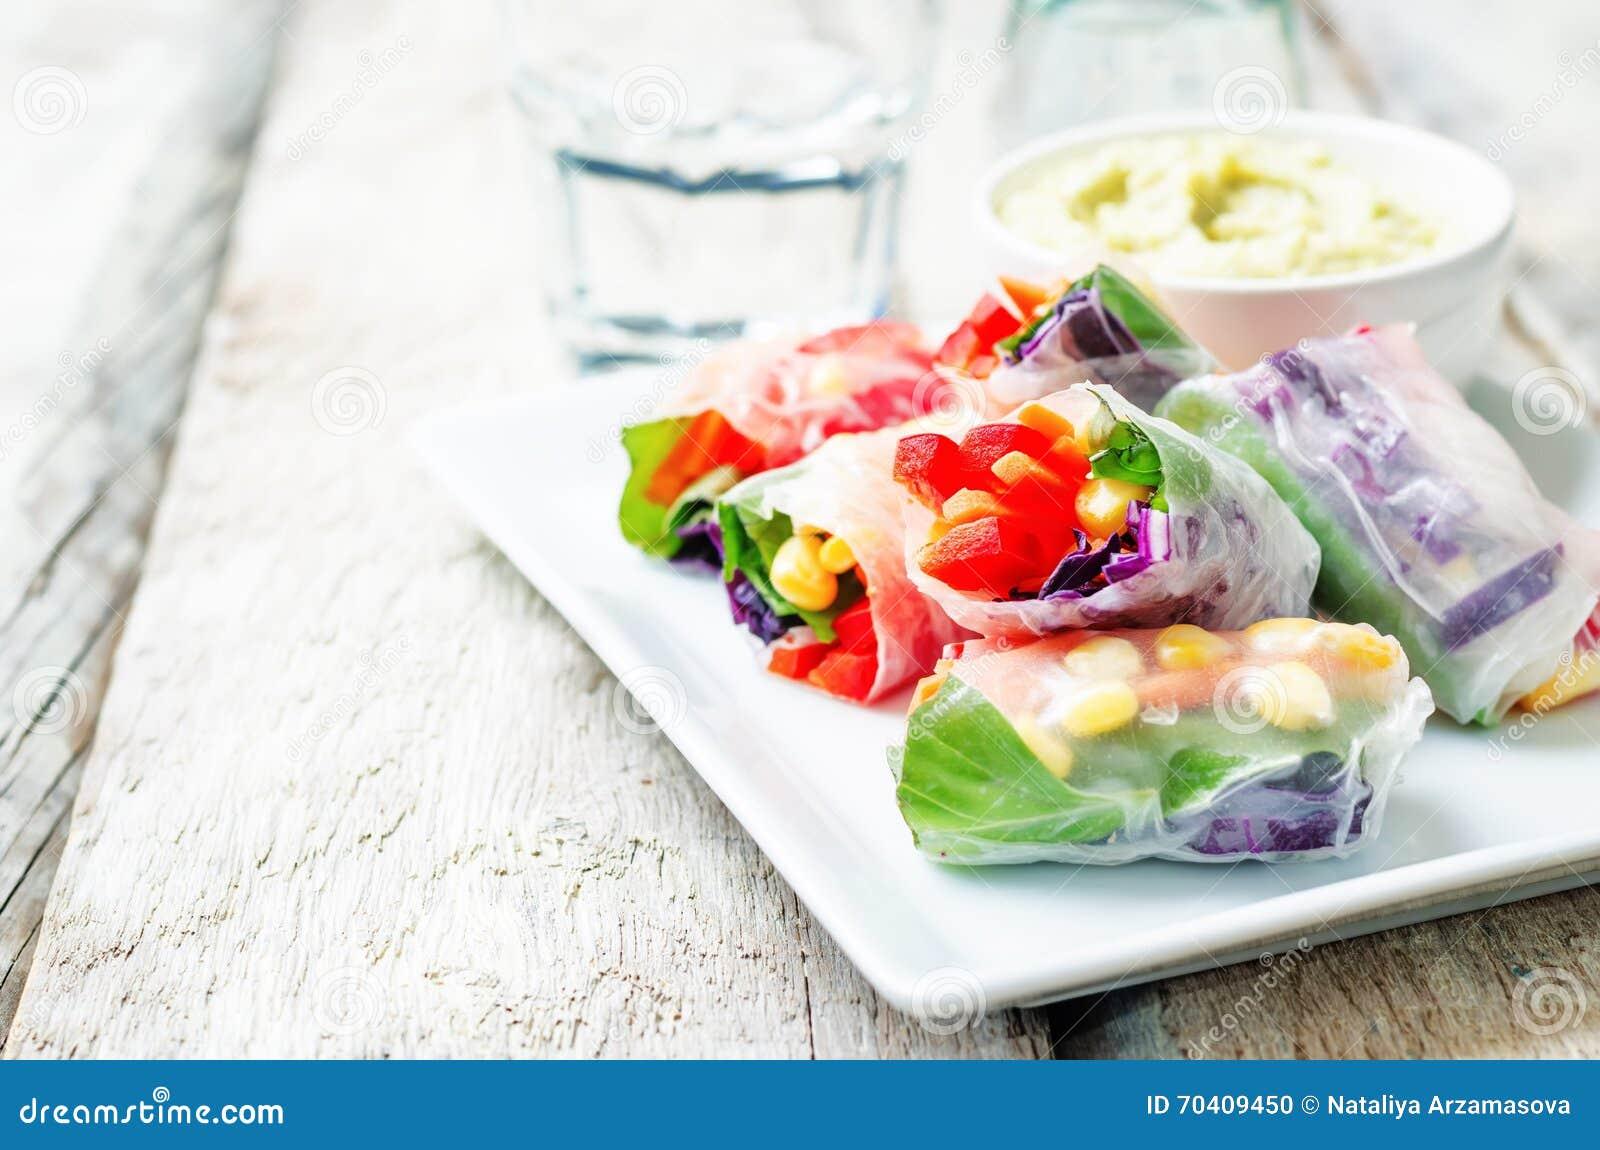 Rainbow Spring Rolls With Avocado White Bean Hummus Stock ...